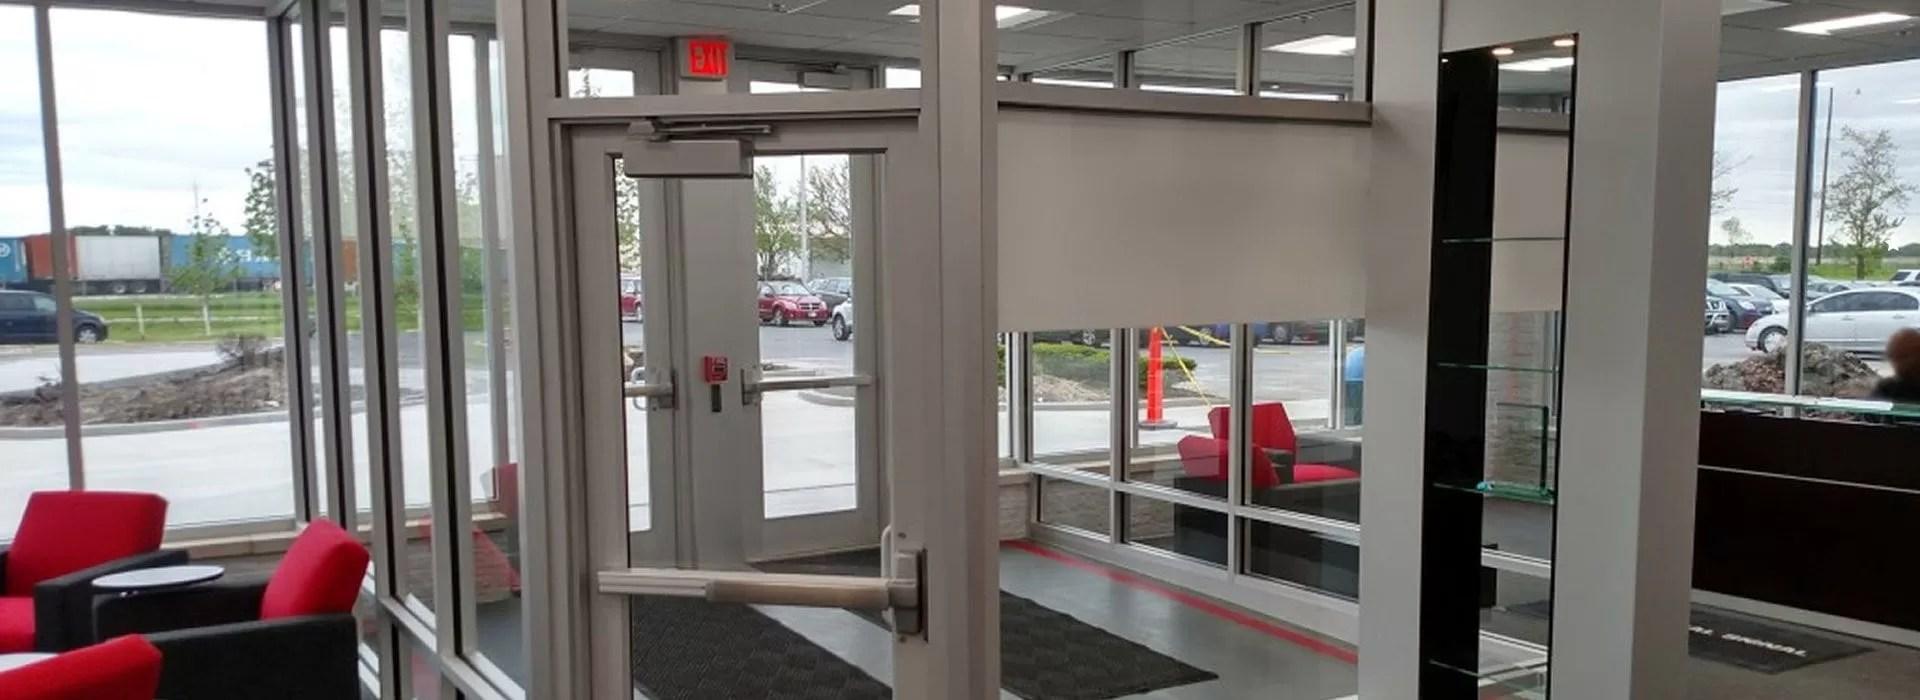 How To Choose An Automatic Door Installer